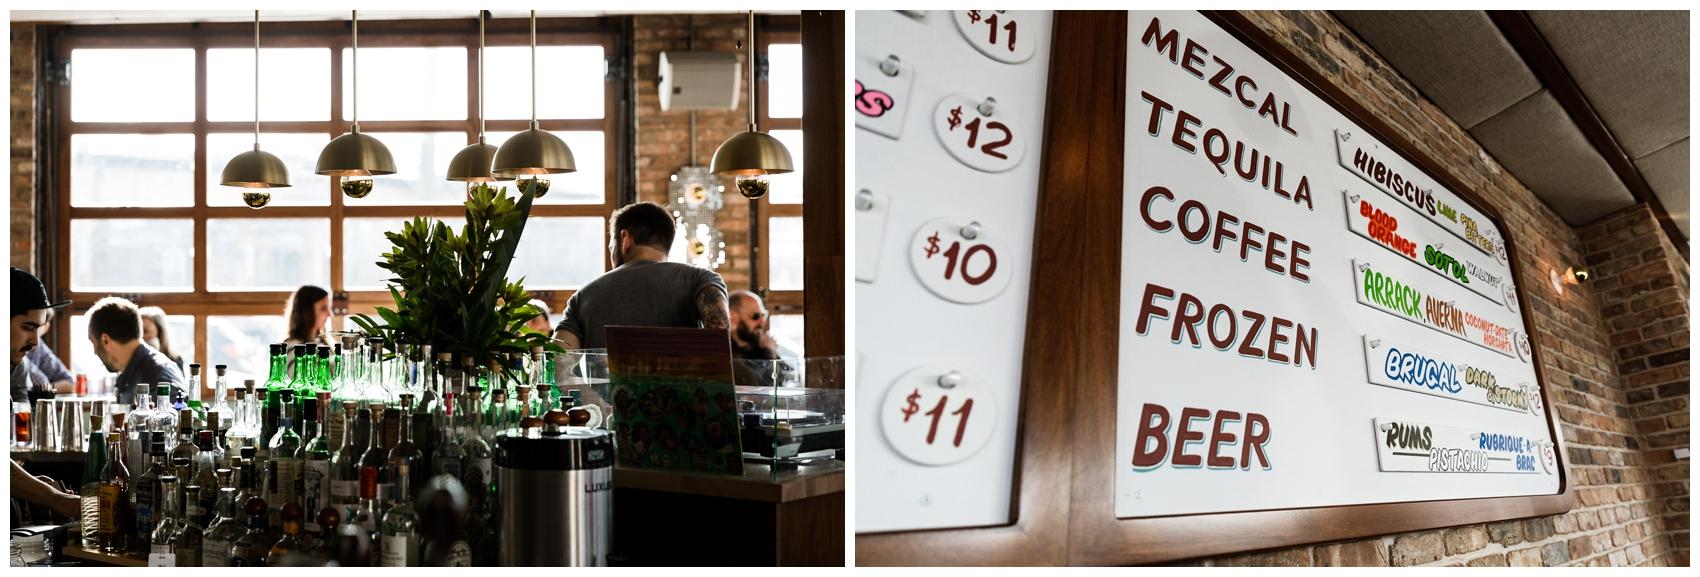 logan square cocktail bar